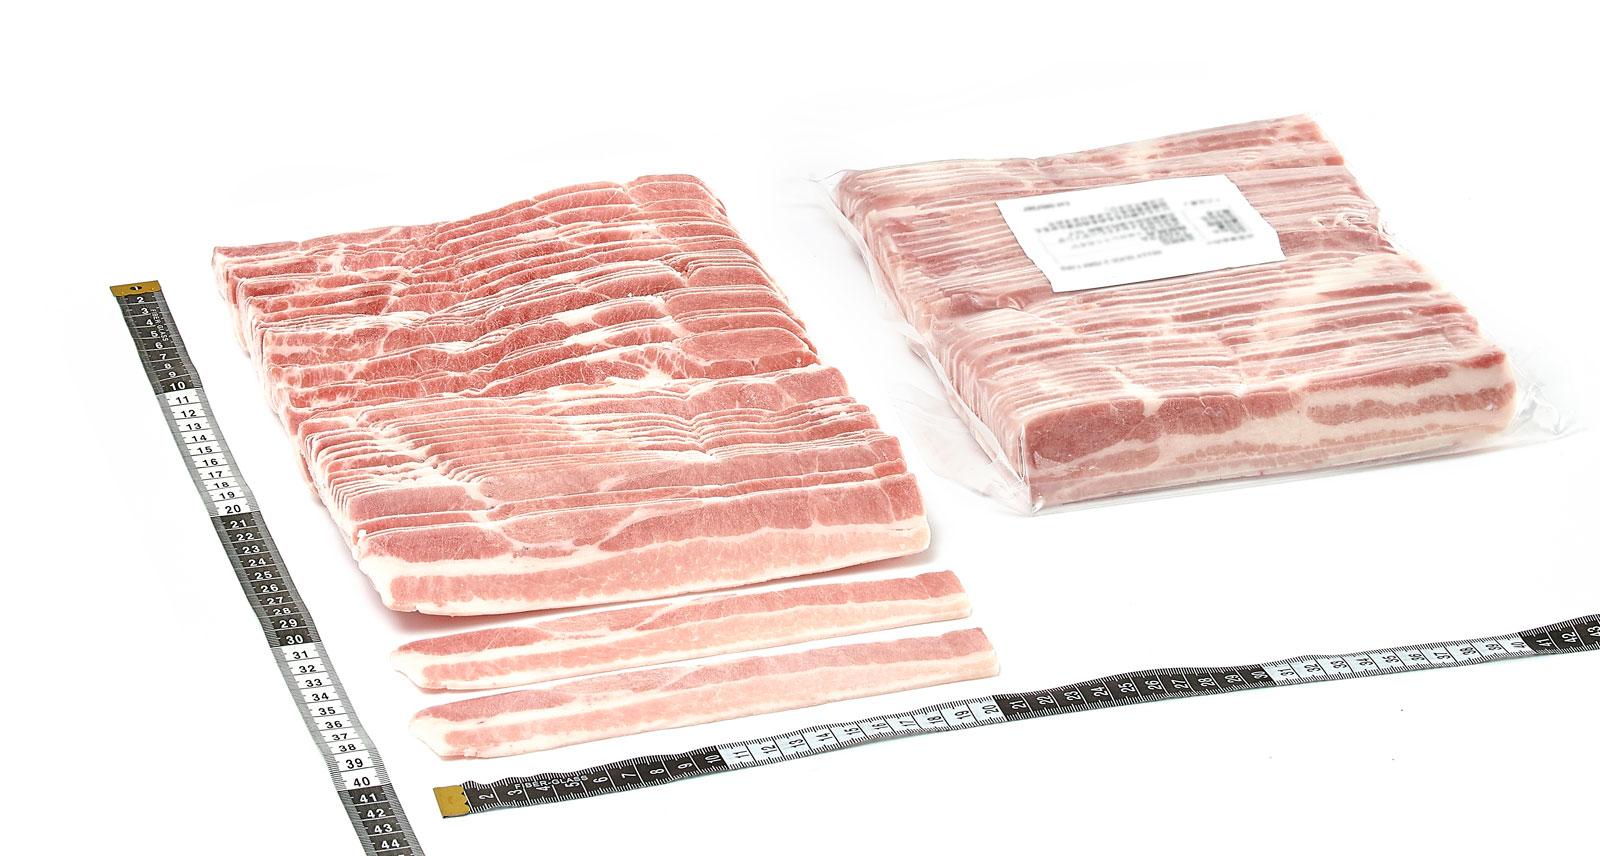 Meat of Pork